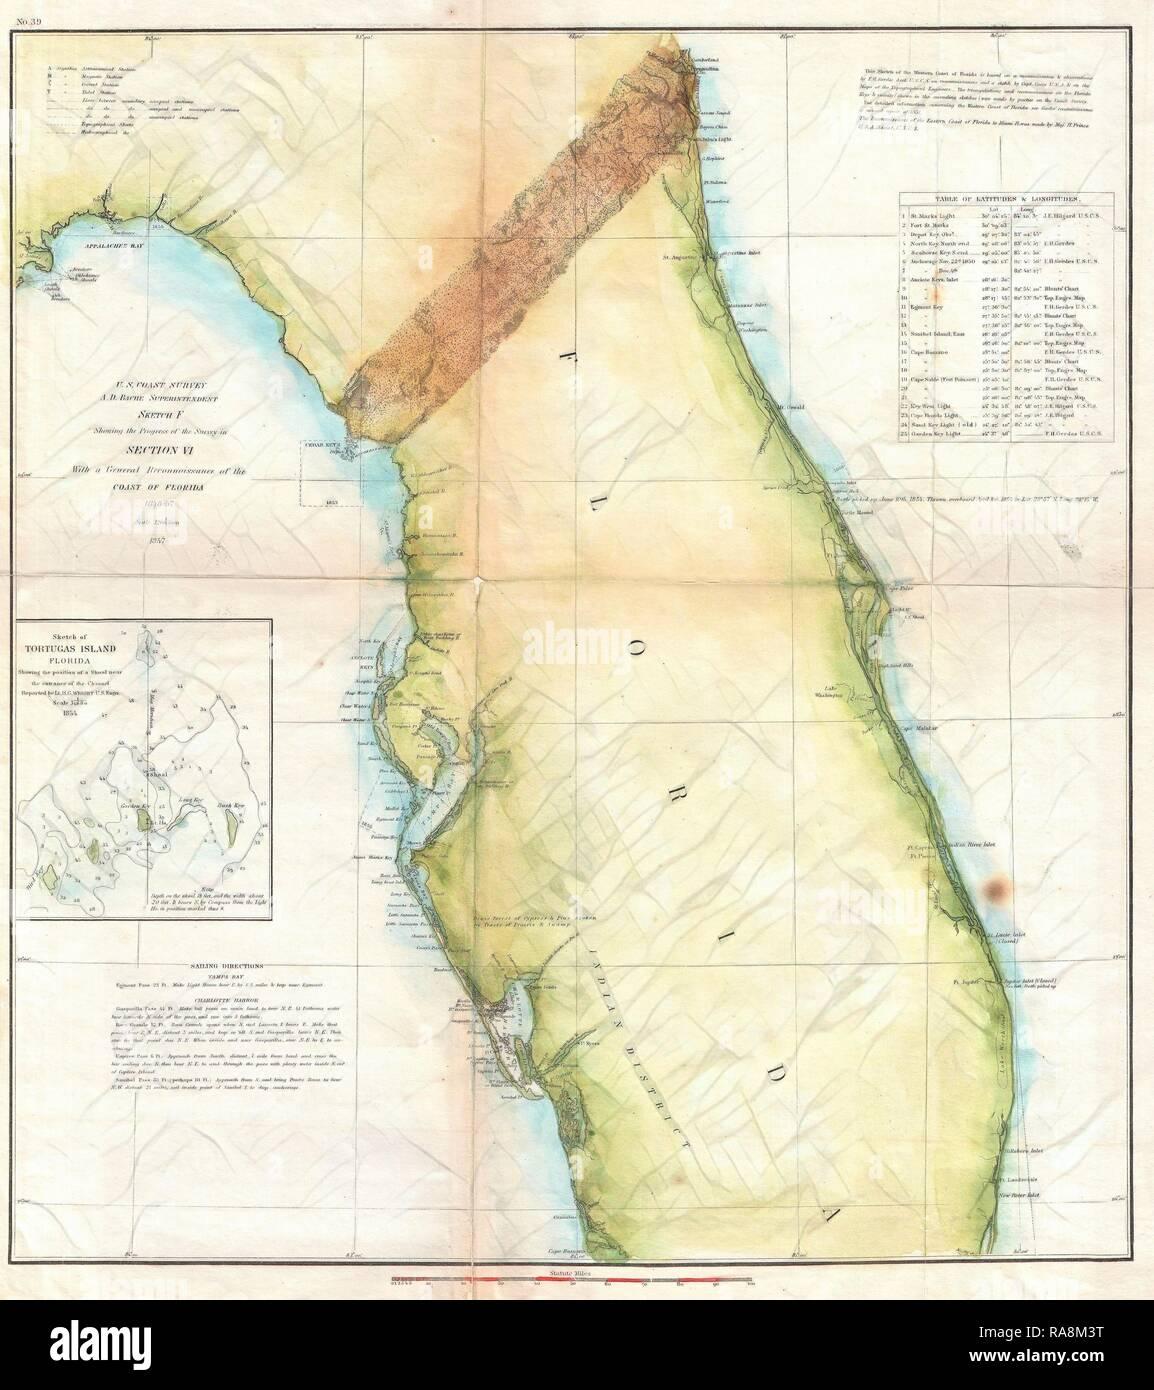 1857, U.S. Coast Survey Map of Florida. Reimagined by Gibon ...